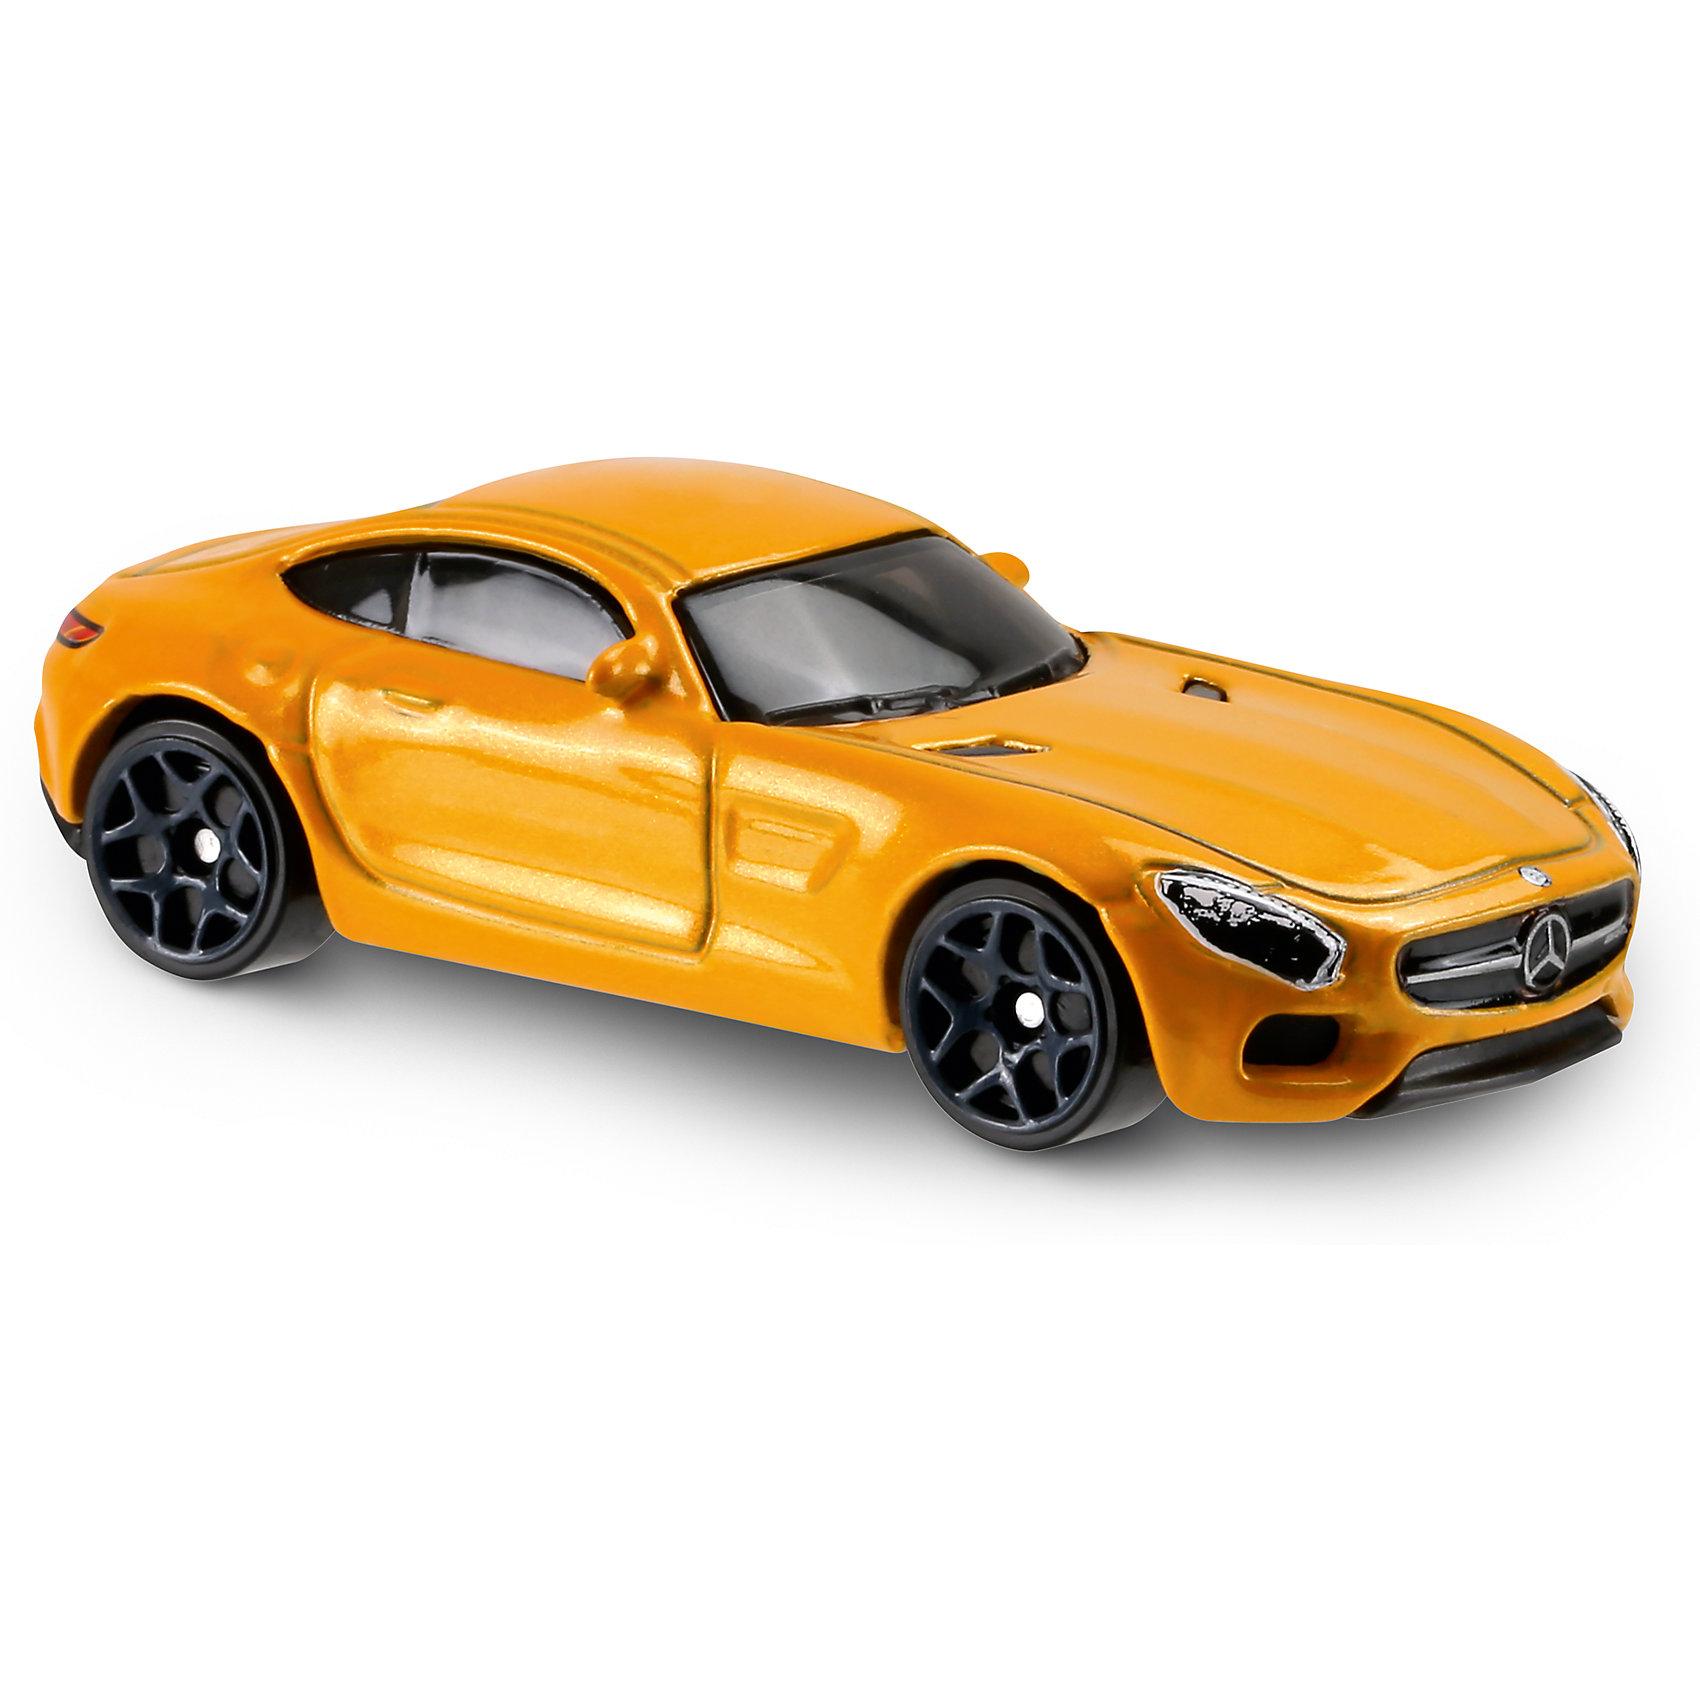 Базовая машинка Hot Wheels, 15 Mercedes-AMG GTПопулярные игрушки<br><br><br>Ширина мм: 110<br>Глубина мм: 45<br>Высота мм: 110<br>Вес г: 30<br>Возраст от месяцев: 36<br>Возраст до месяцев: 96<br>Пол: Мужской<br>Возраст: Детский<br>SKU: 7111110